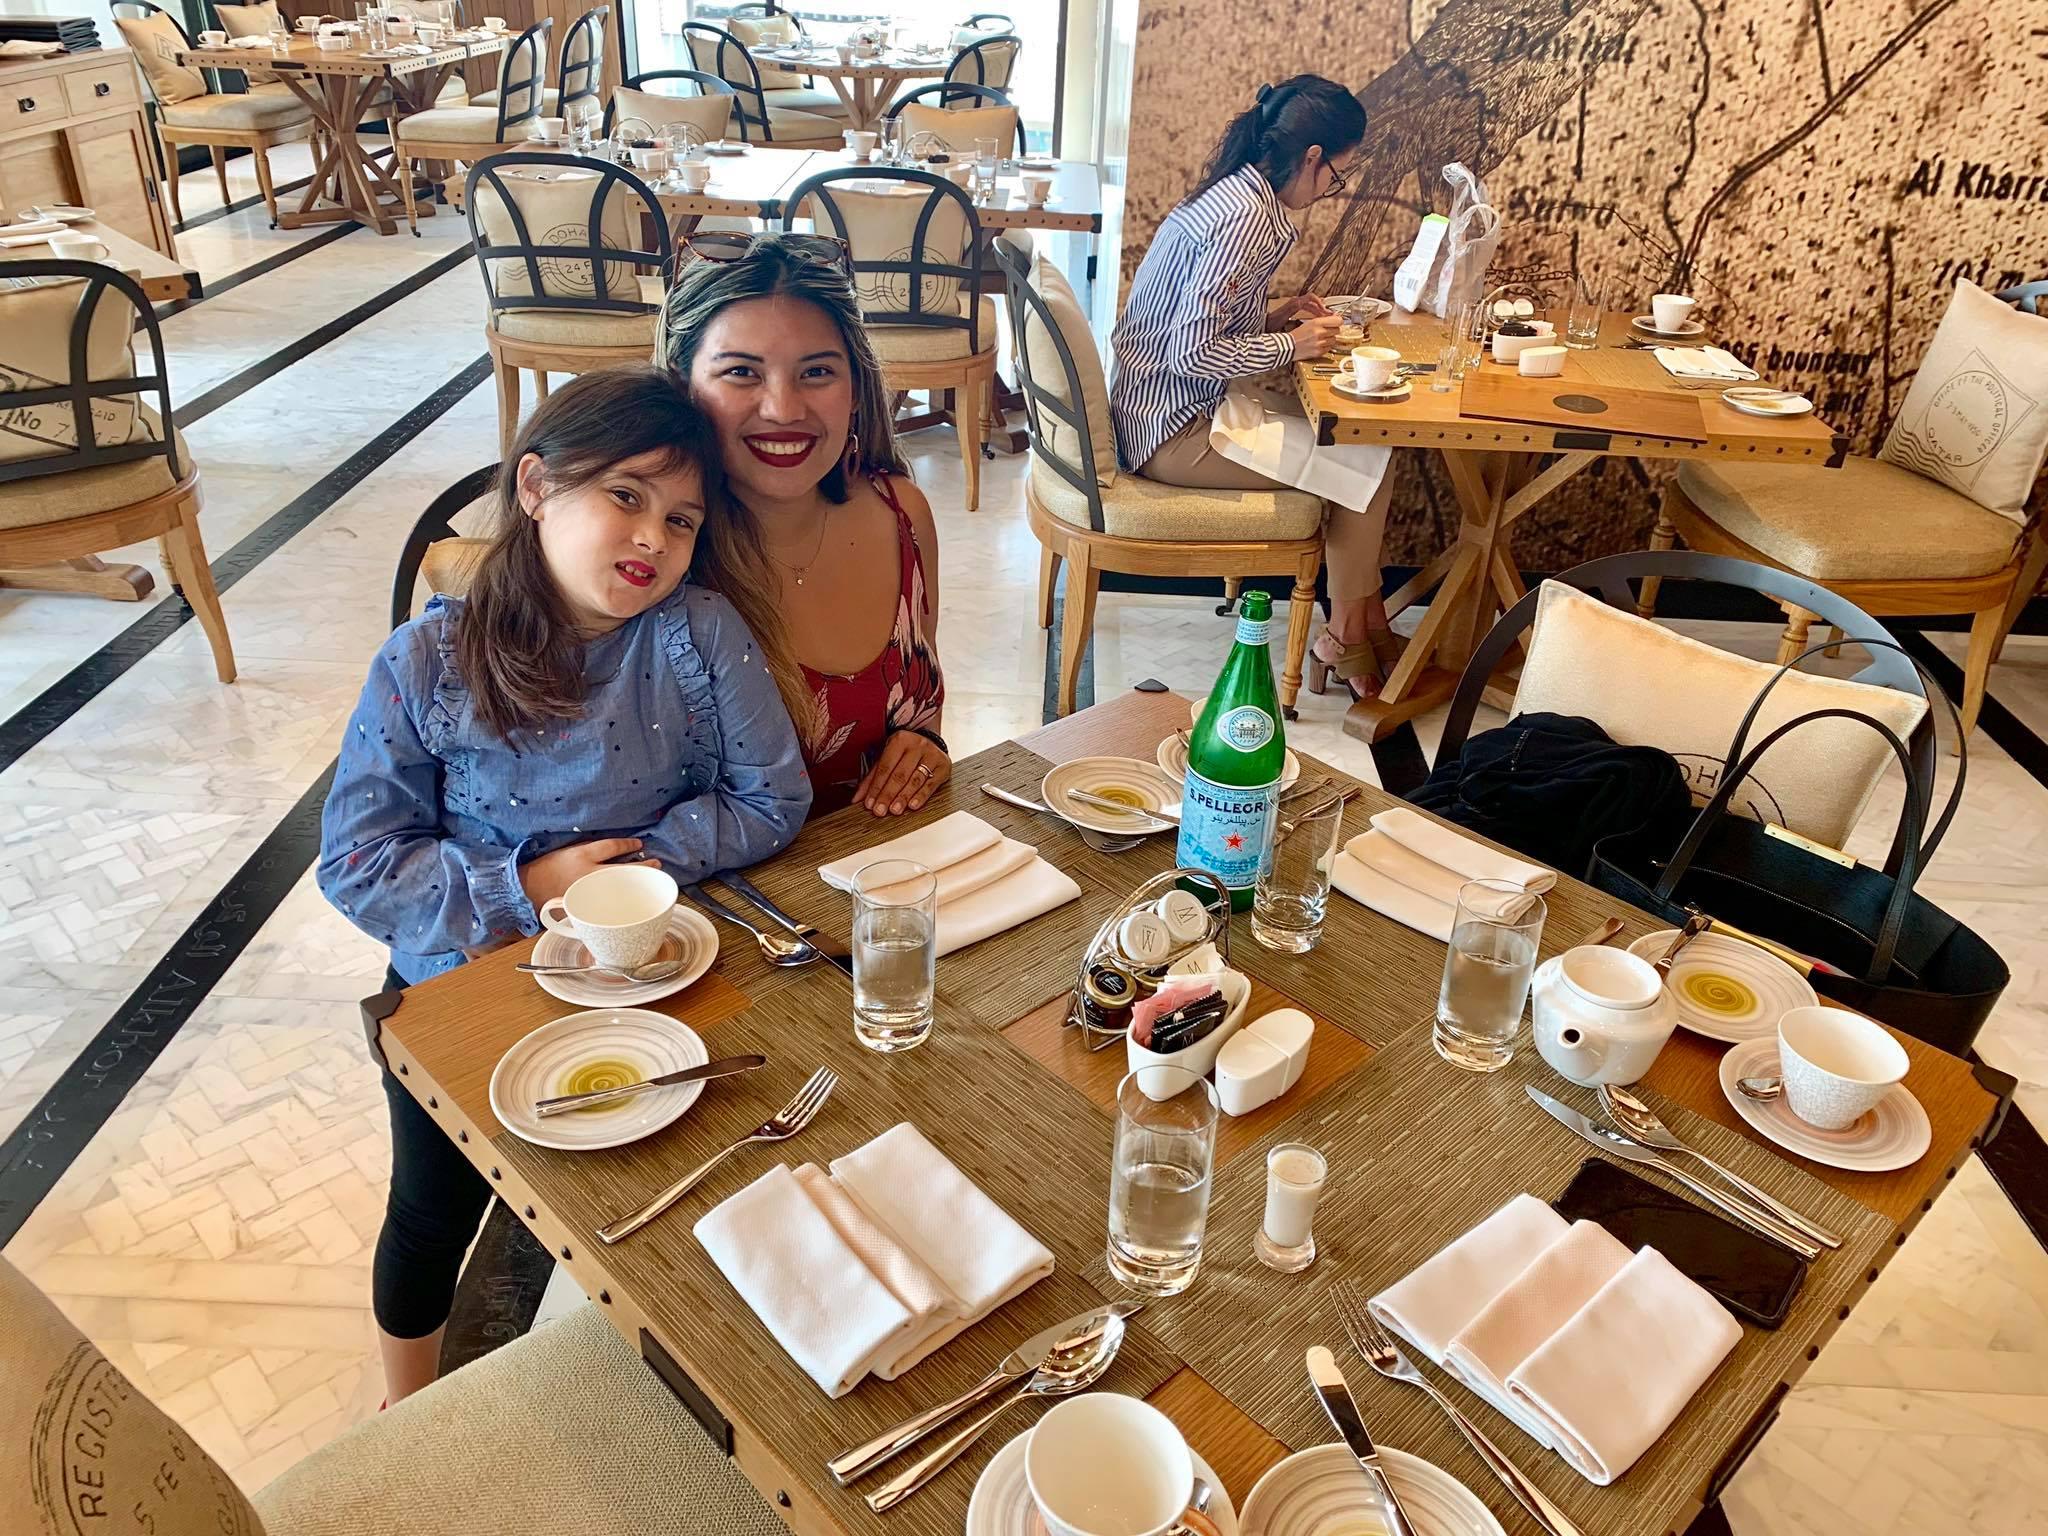 Kach Solo Travels in 2019 I did a 20-hour layover in Doha, QATAR8.jpg